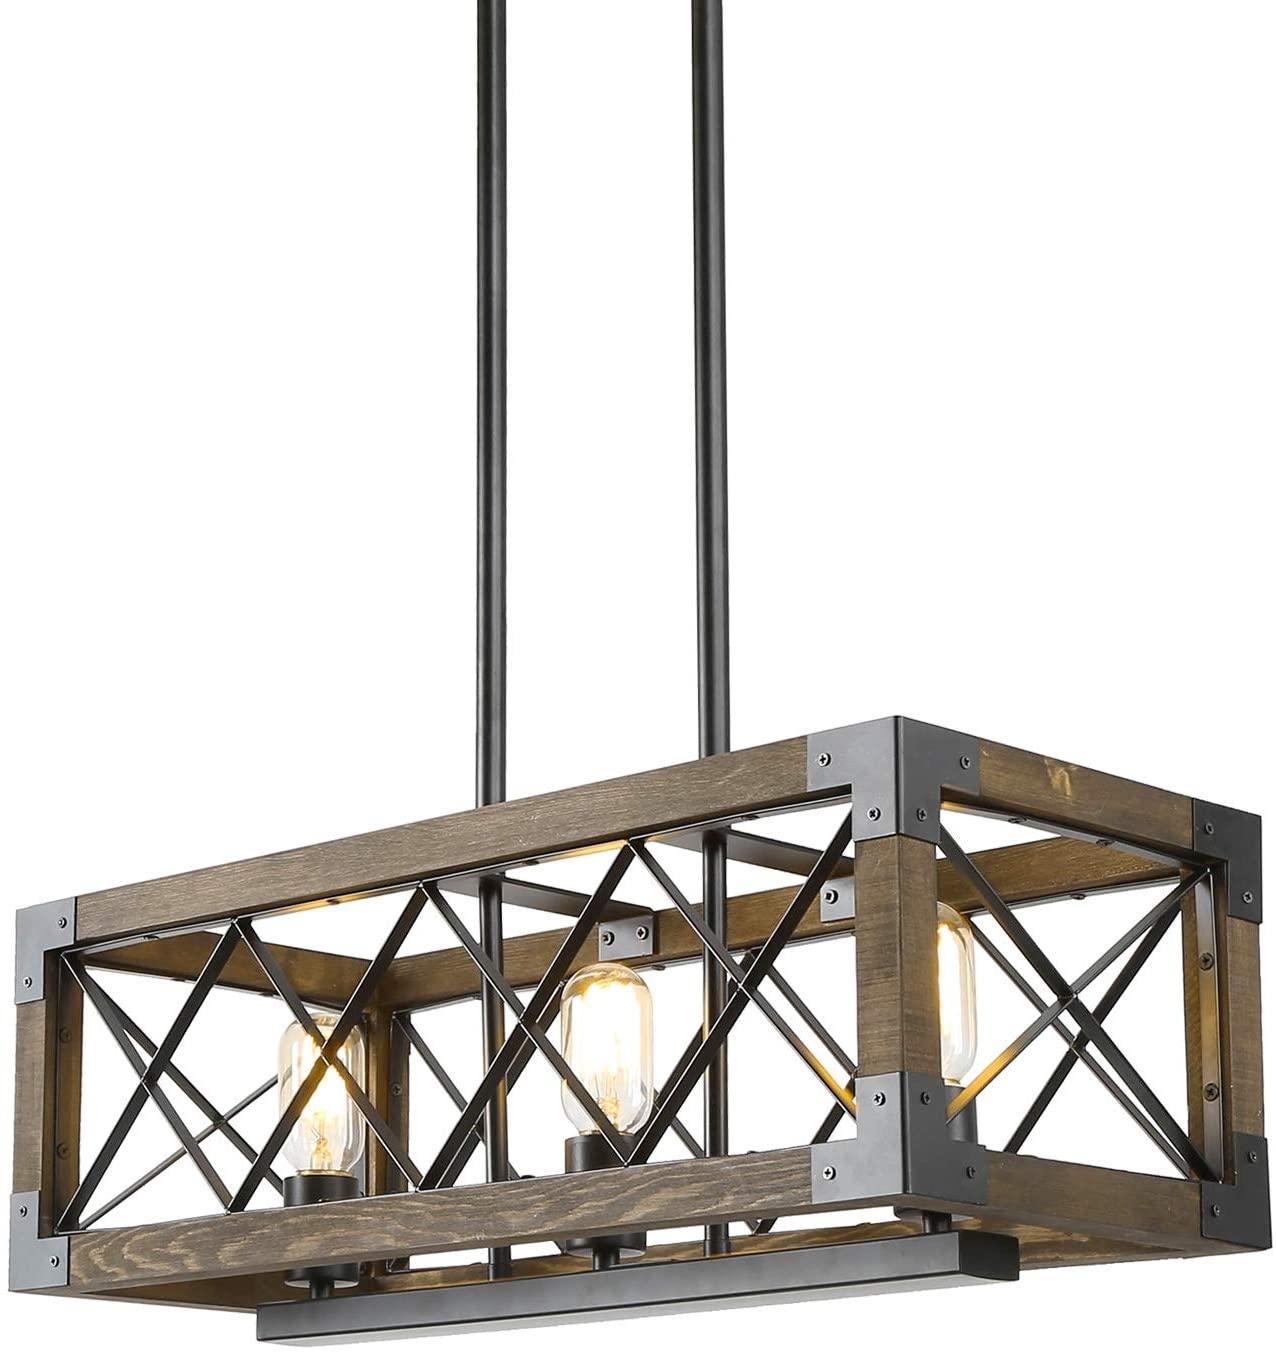 "LALUZ Dining Room Lighting Fixtures Hanging,3-Lights Open-Caged Farmhouse Chandelier,Rectangular Farmhouse Light Fixture 23.6""L x 10''W x 10""H"